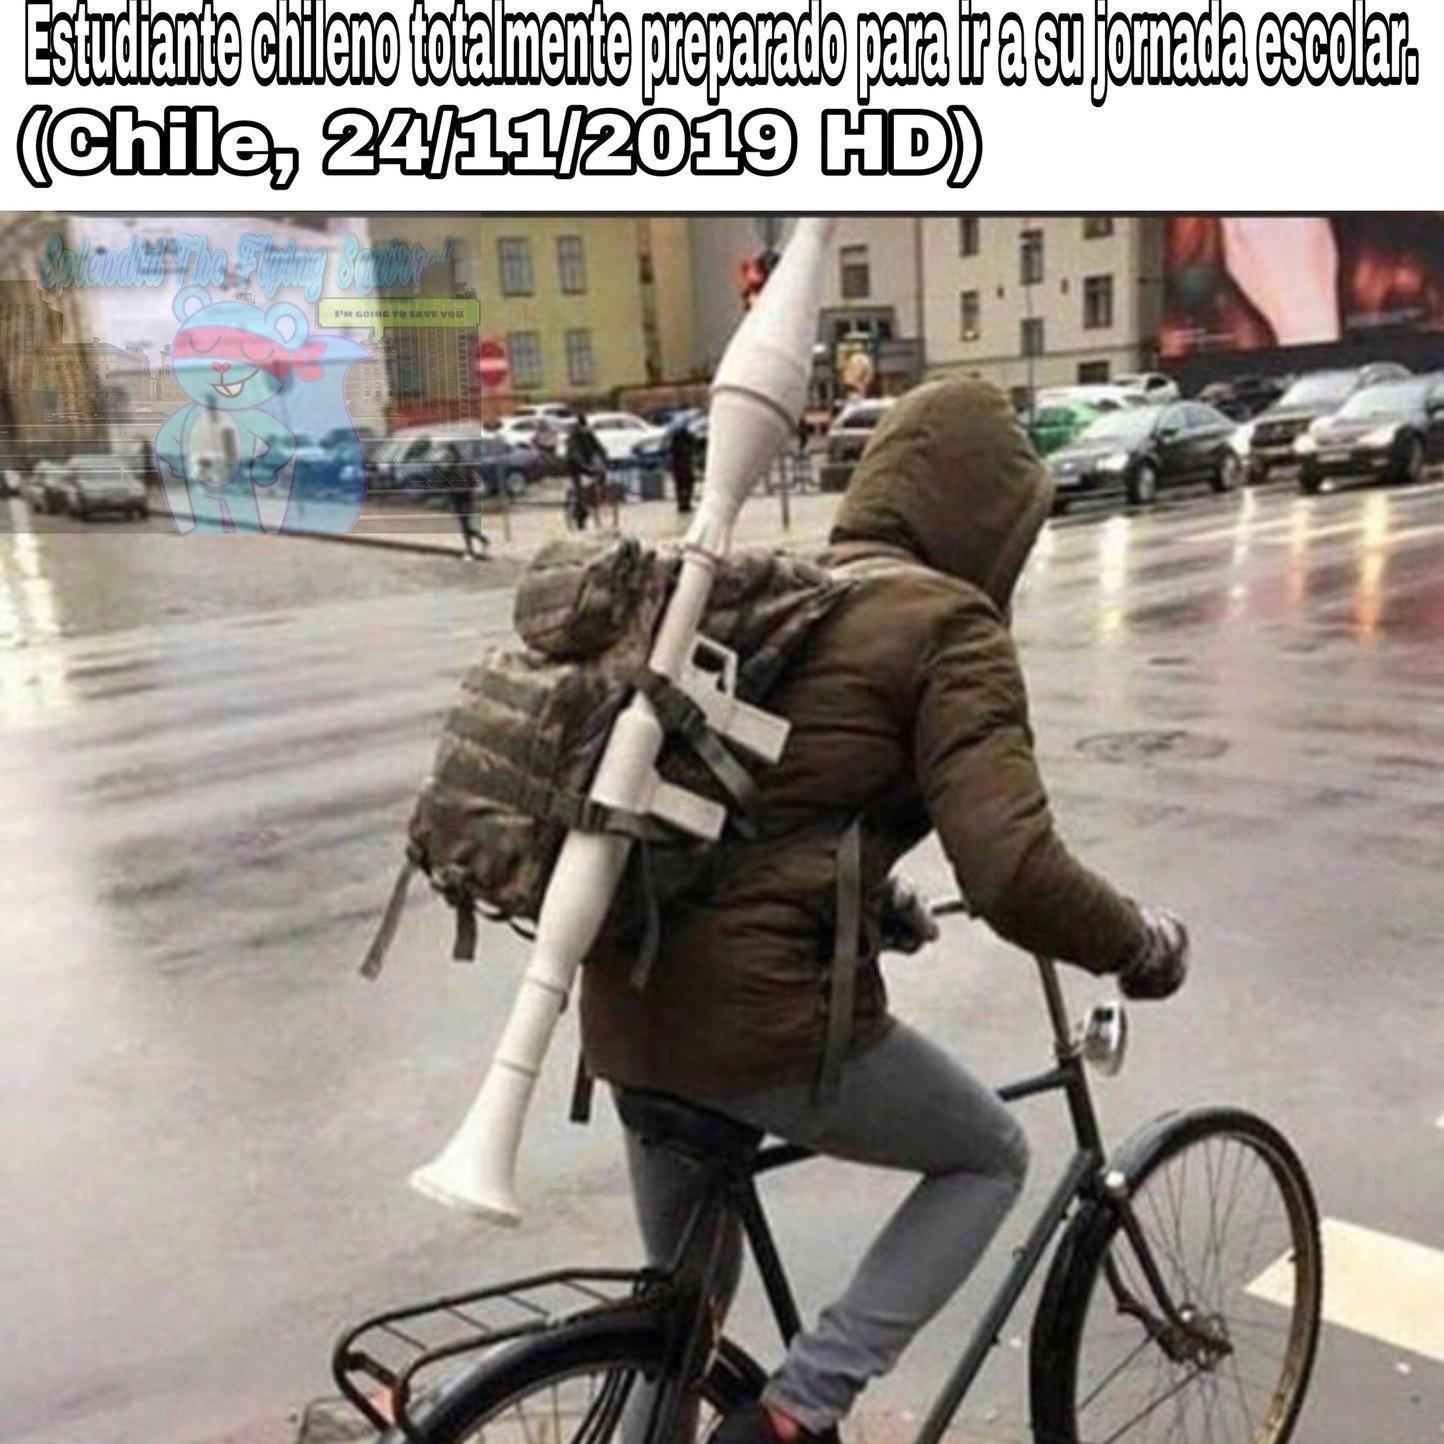 vamos pa' Chile-Zuela - meme